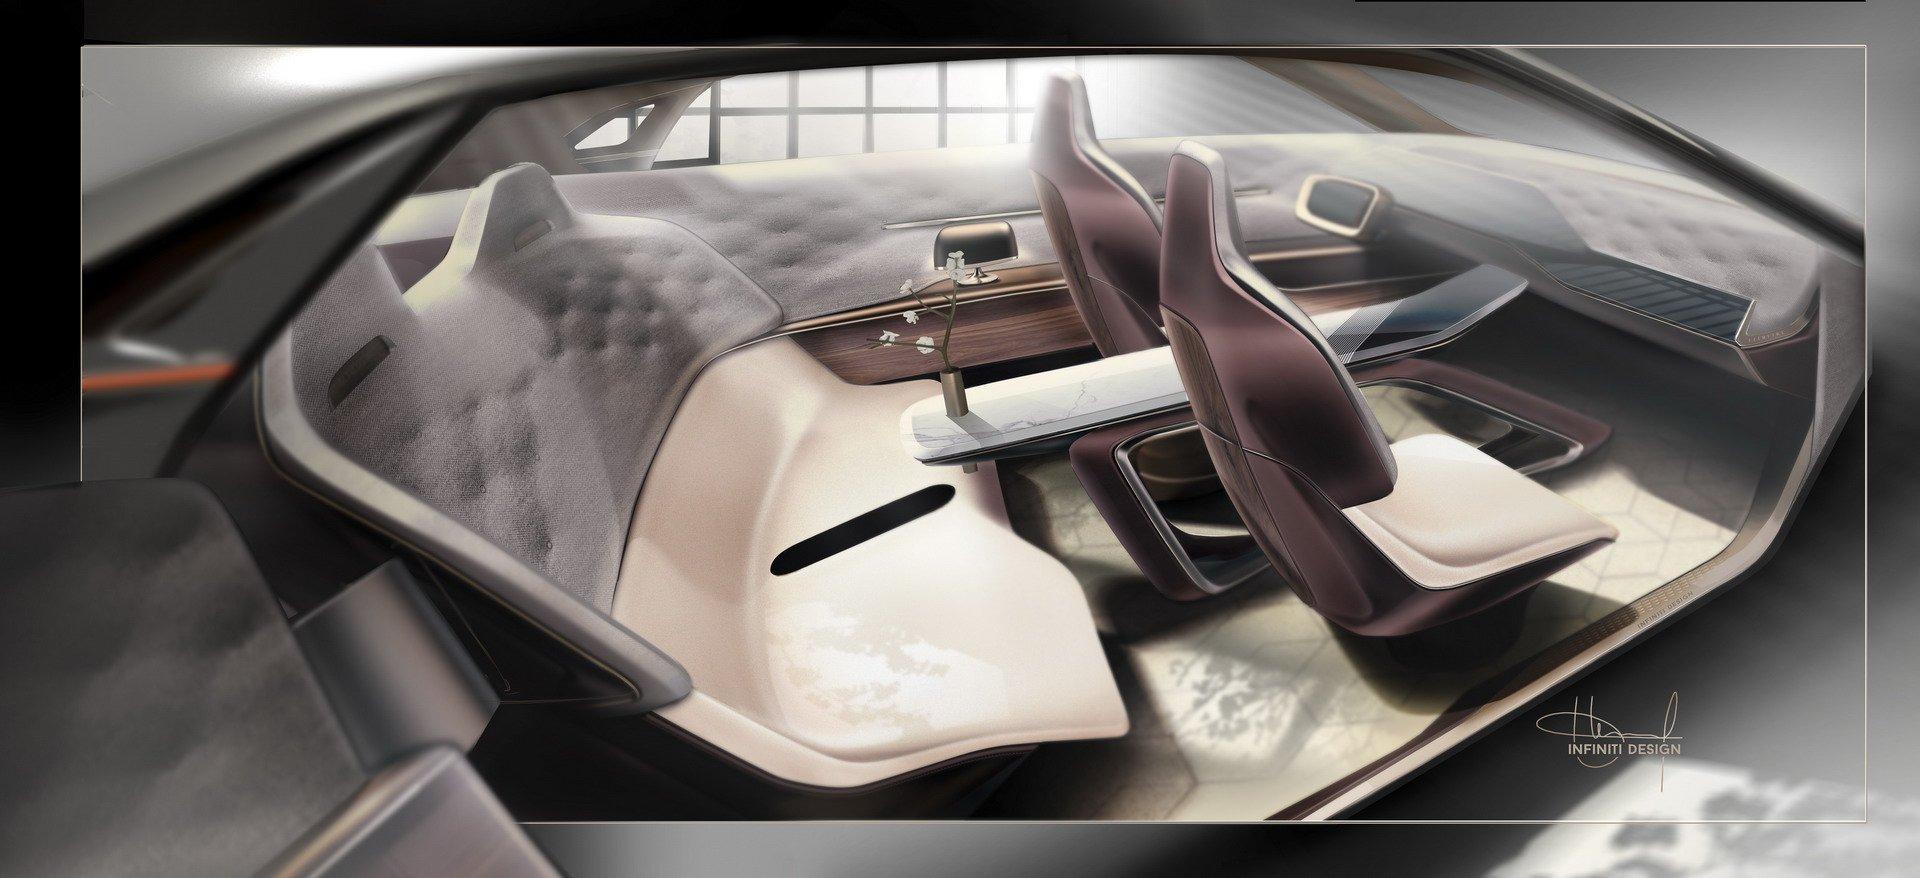 Infiniti qx inspiration concept 2019 design sketch interior